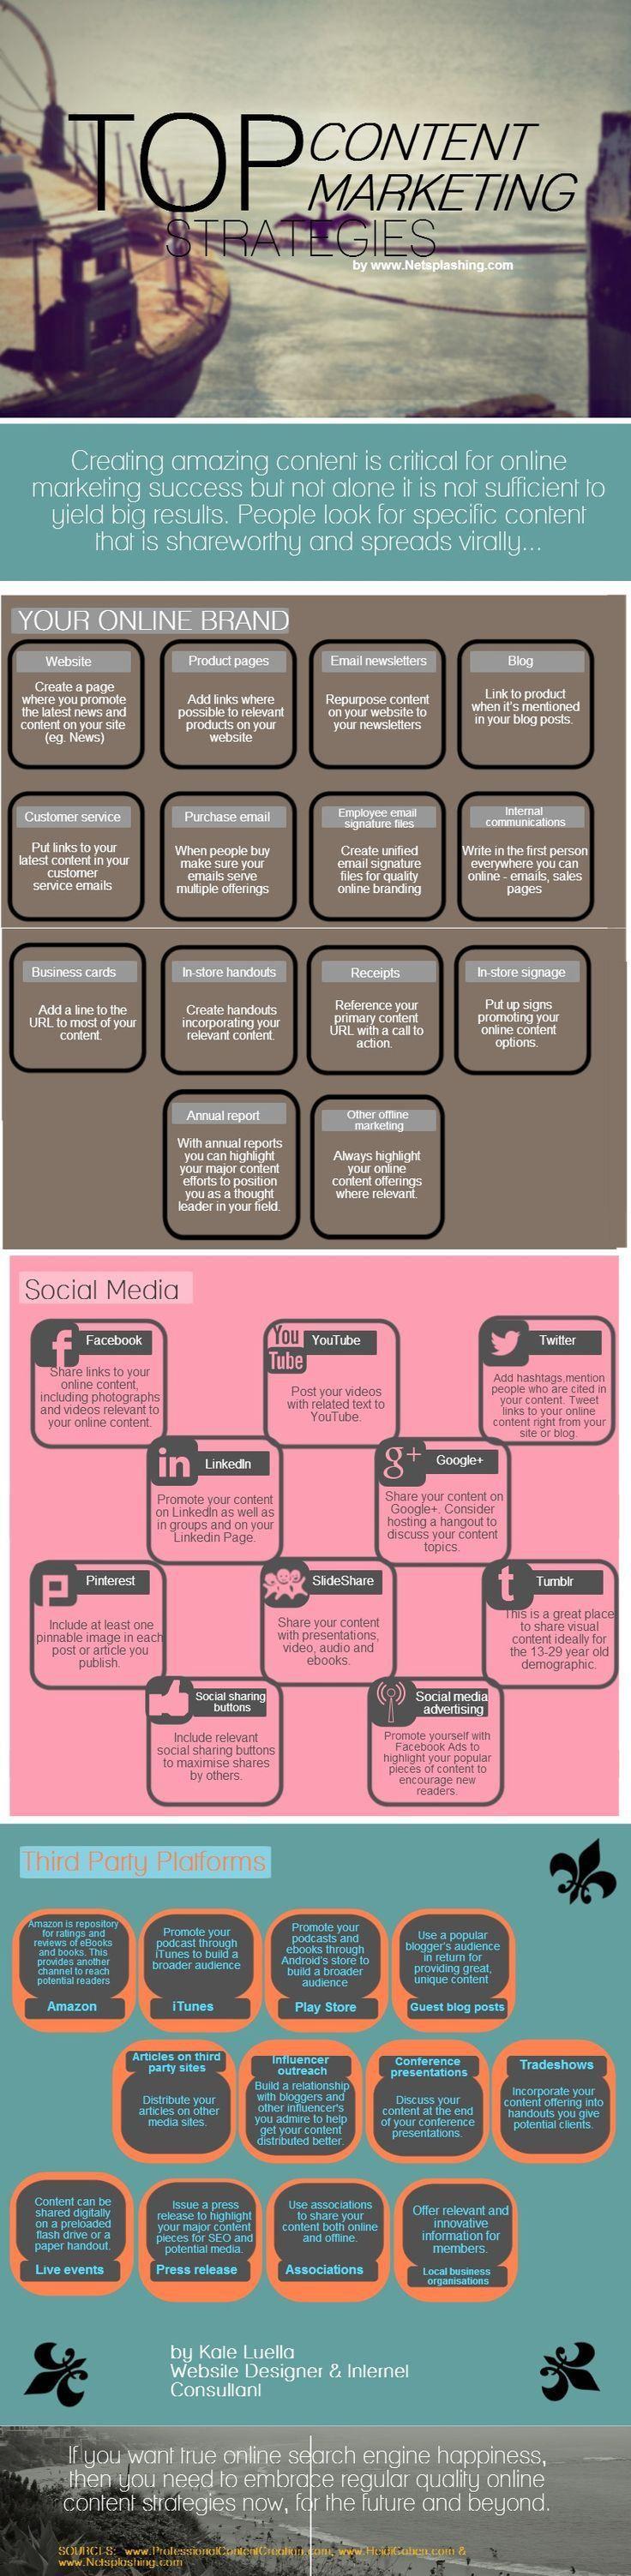 Top Content Marketing Strategies via @angela4design  #Infografía by netsplashing.com